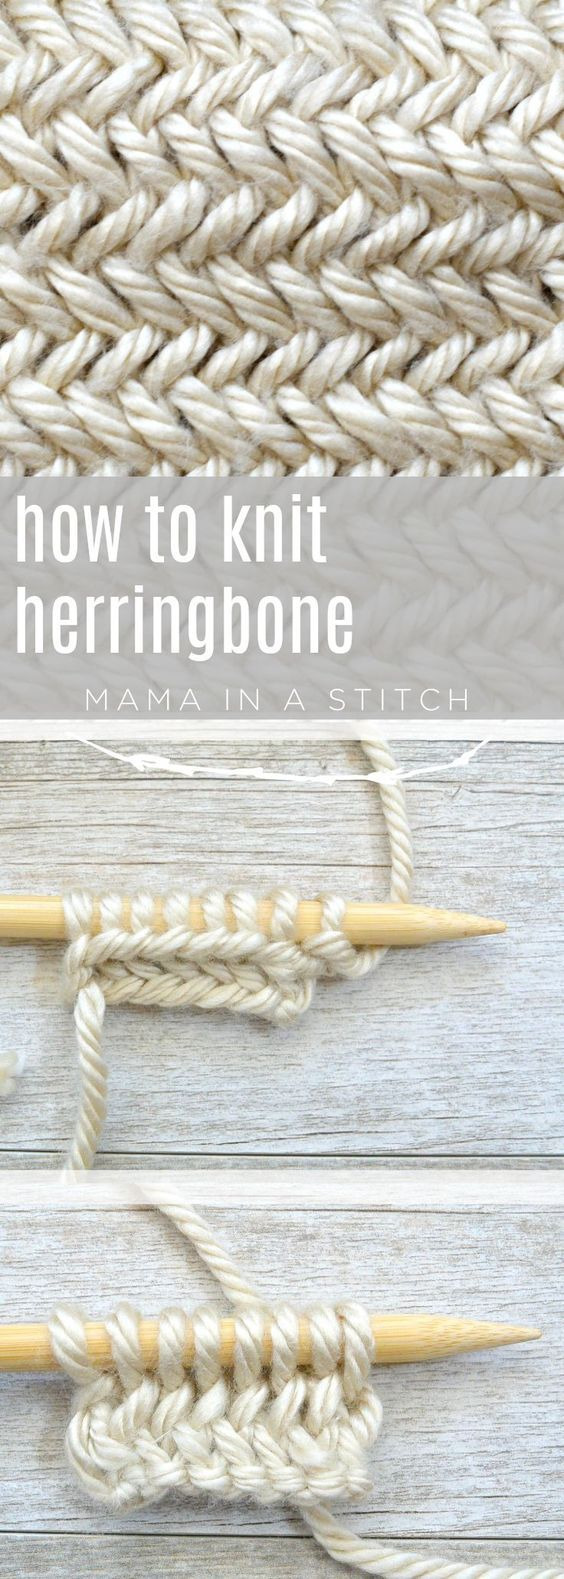 How To Knit the Horizontal Herringbone Stitch #knit